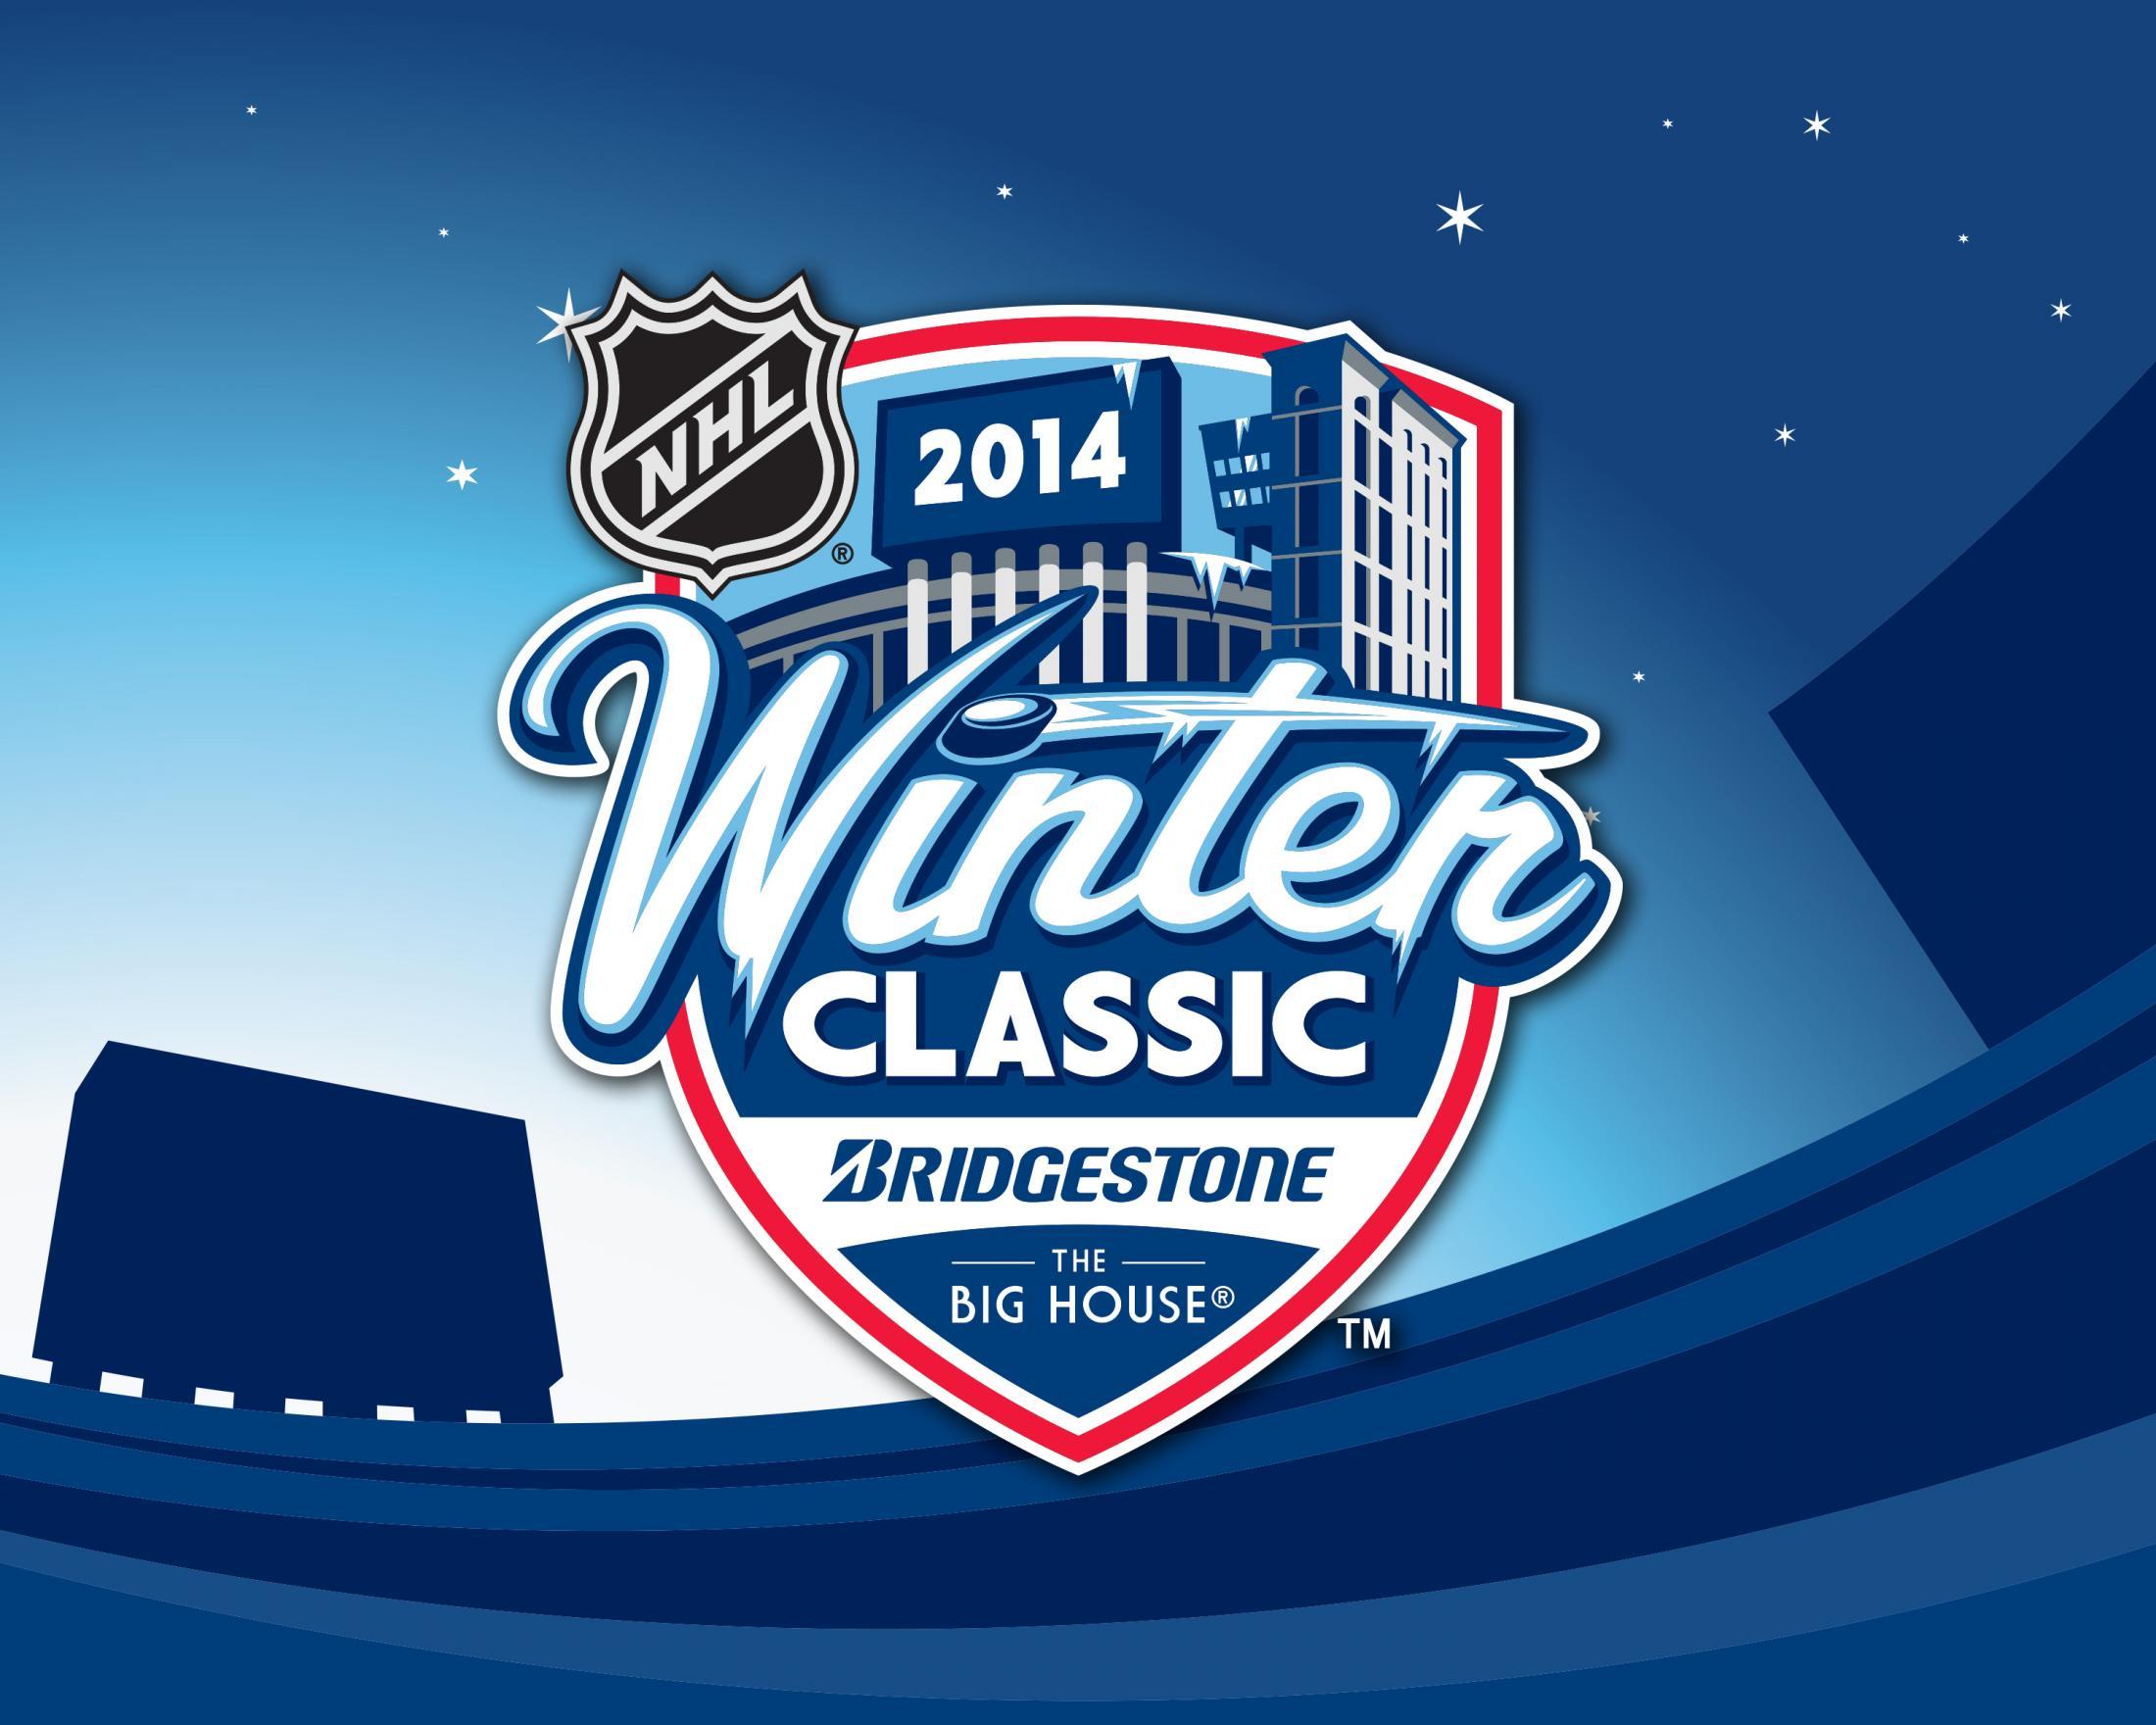 Thumbnail for 2014 BRIDGESTONE NHL WINTER CLASSIC